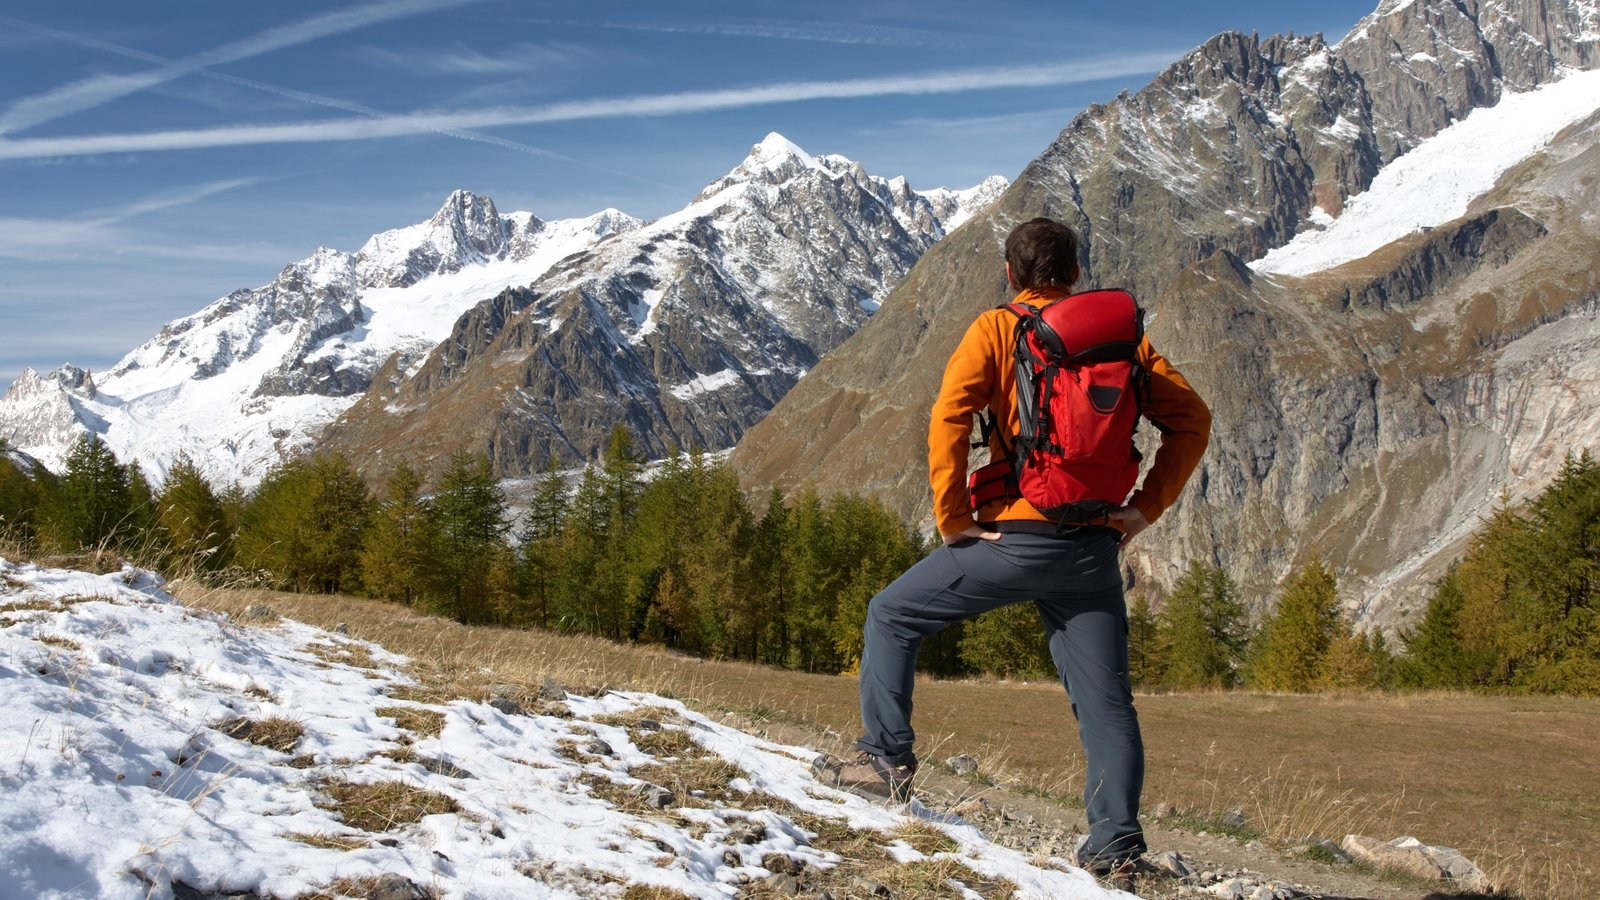 Courmayeur mostrando senderismo o caminata, nieve y montañas